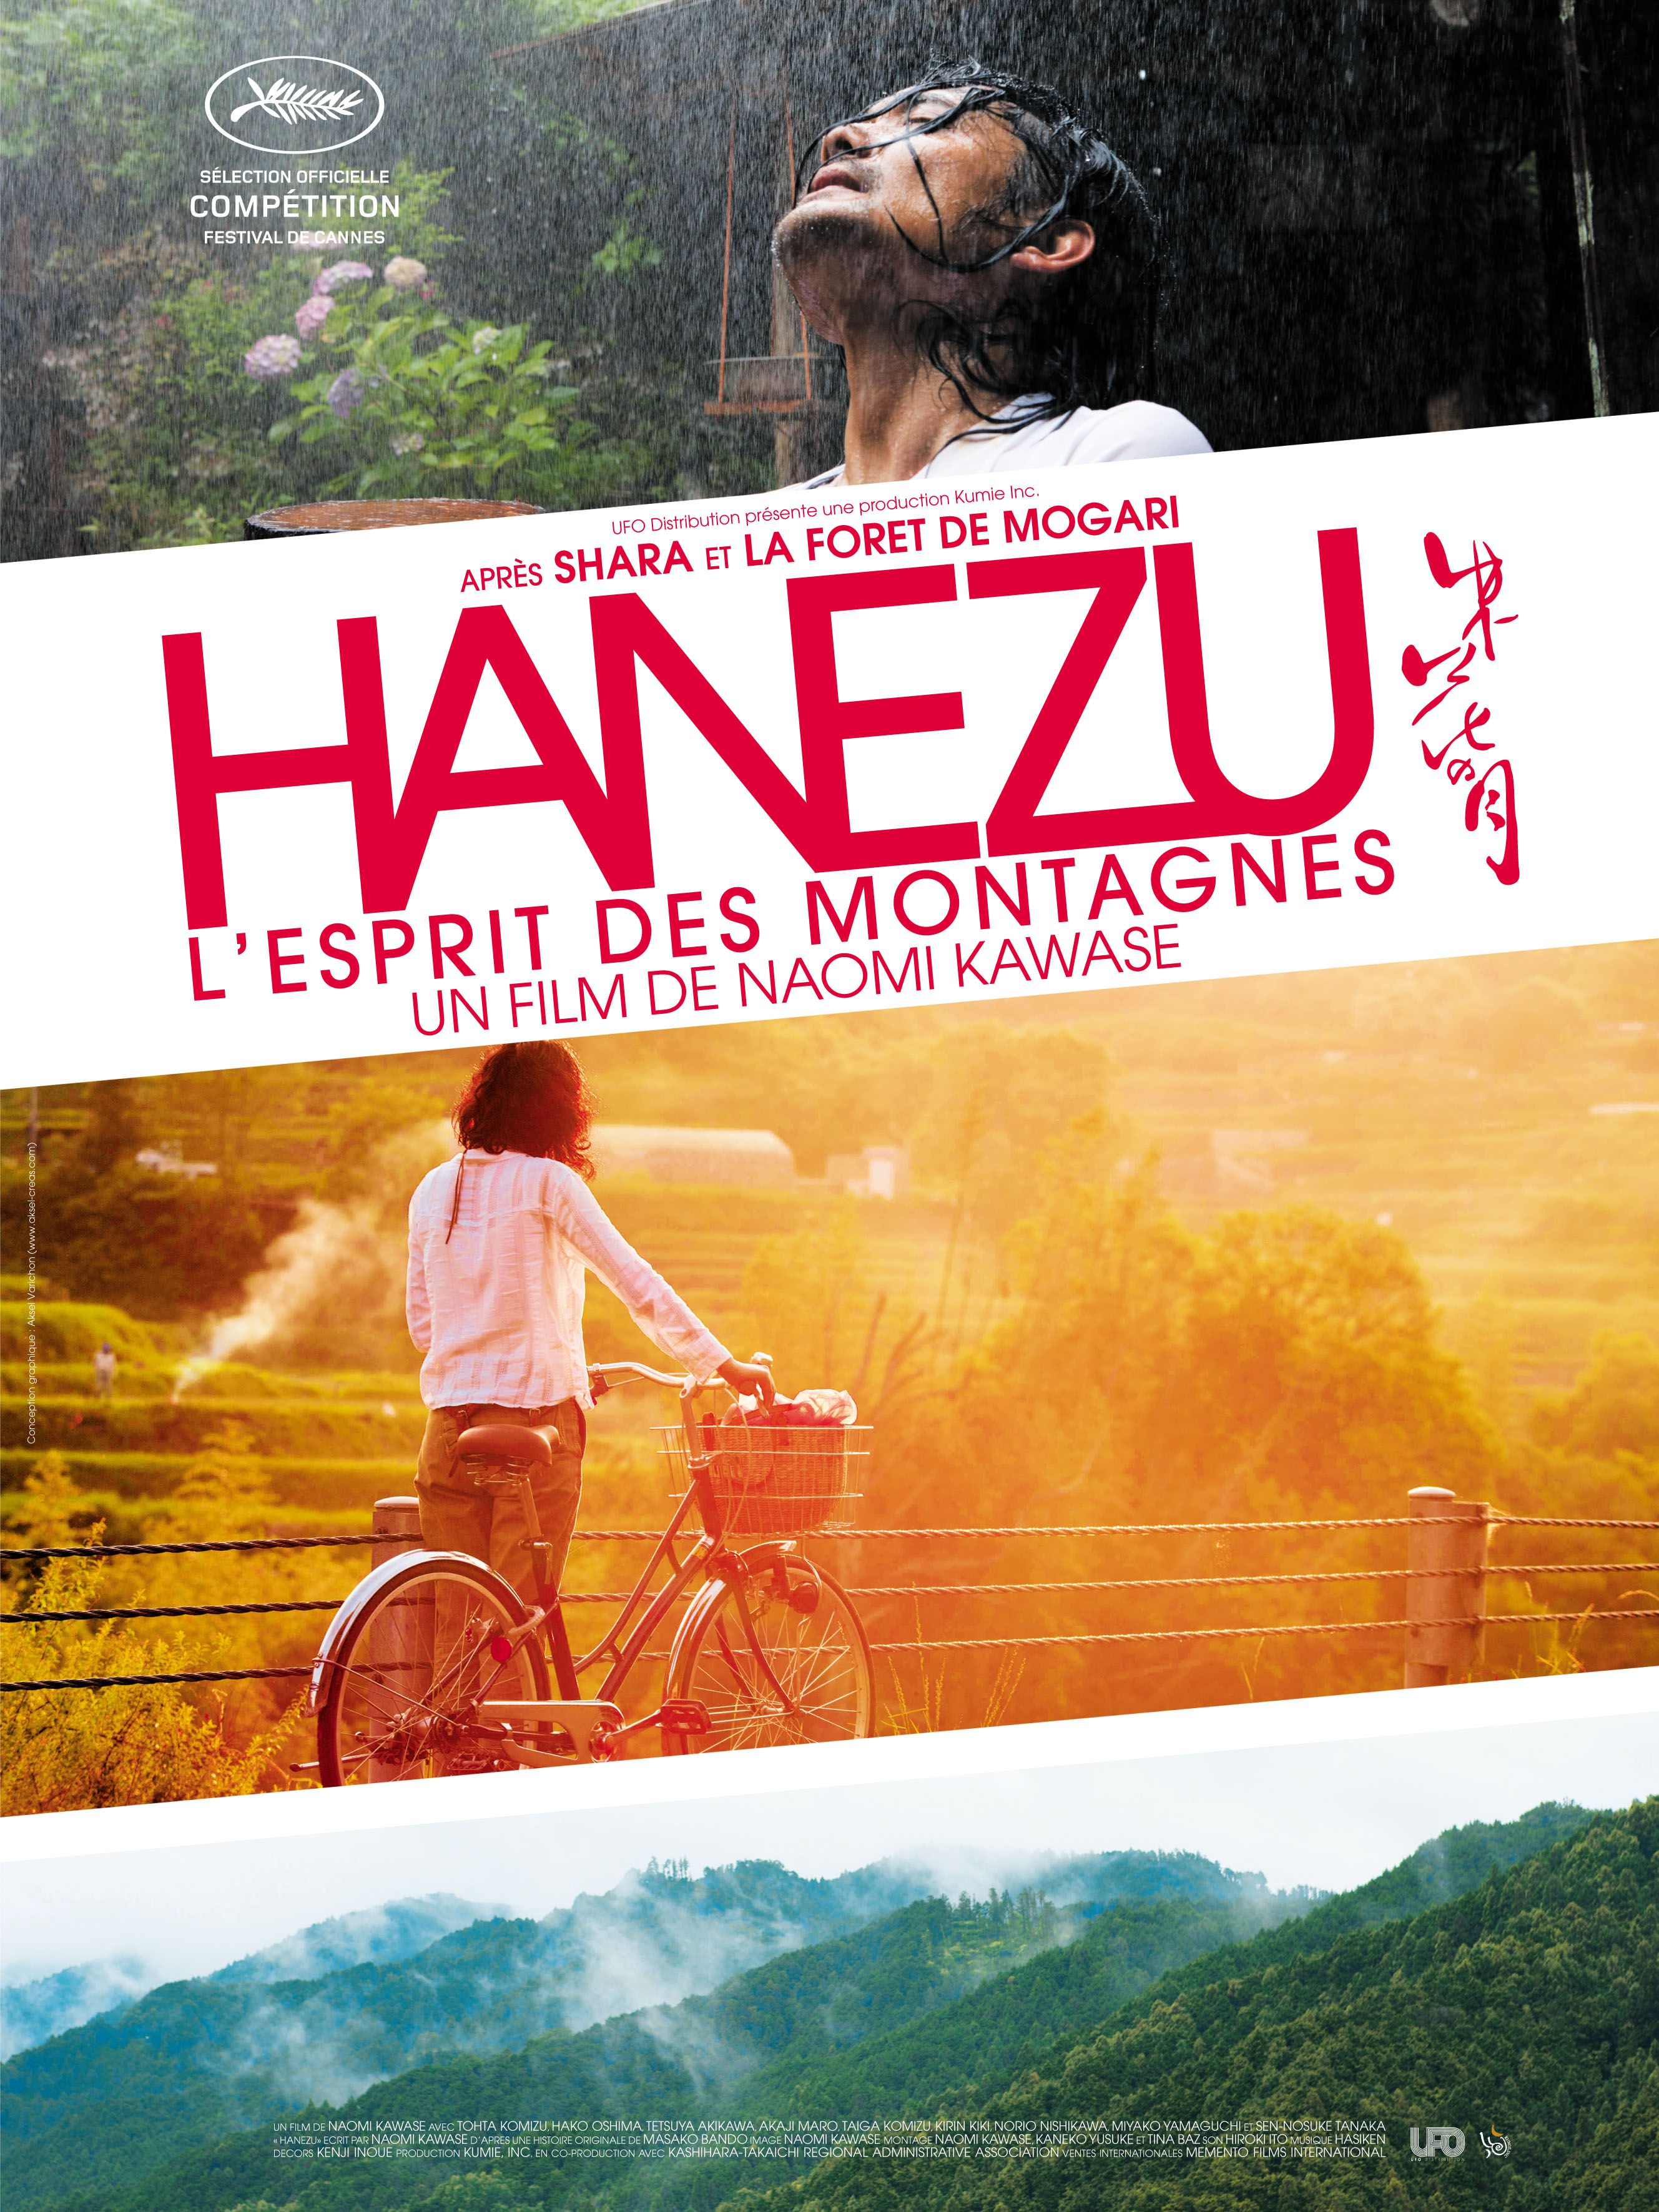 Hanezu, l'esprit des montagnes - Film (2011)